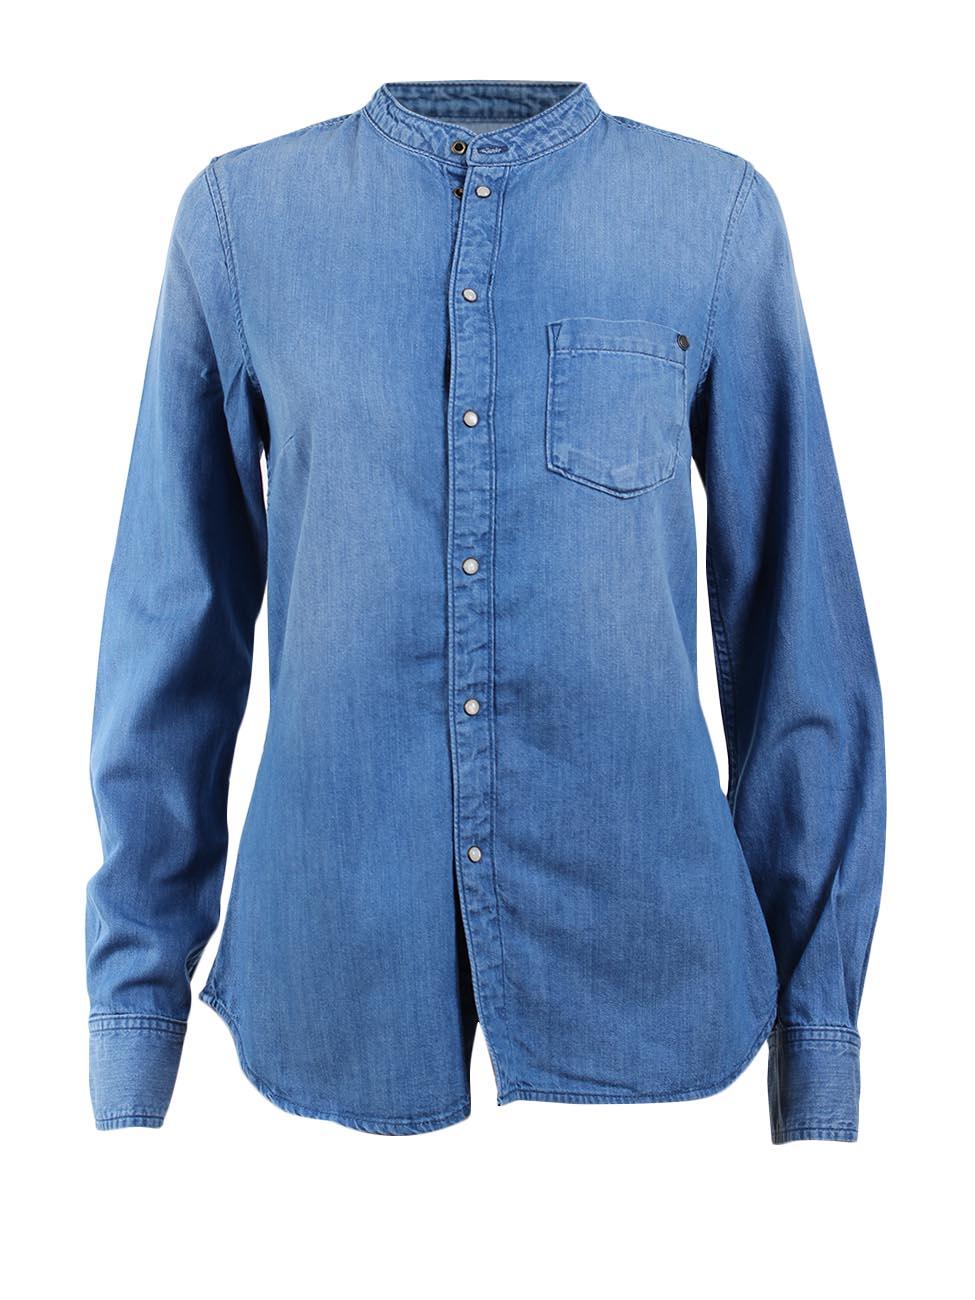 pepe jeans london damen jeanshemd ella blau denim ebay. Black Bedroom Furniture Sets. Home Design Ideas